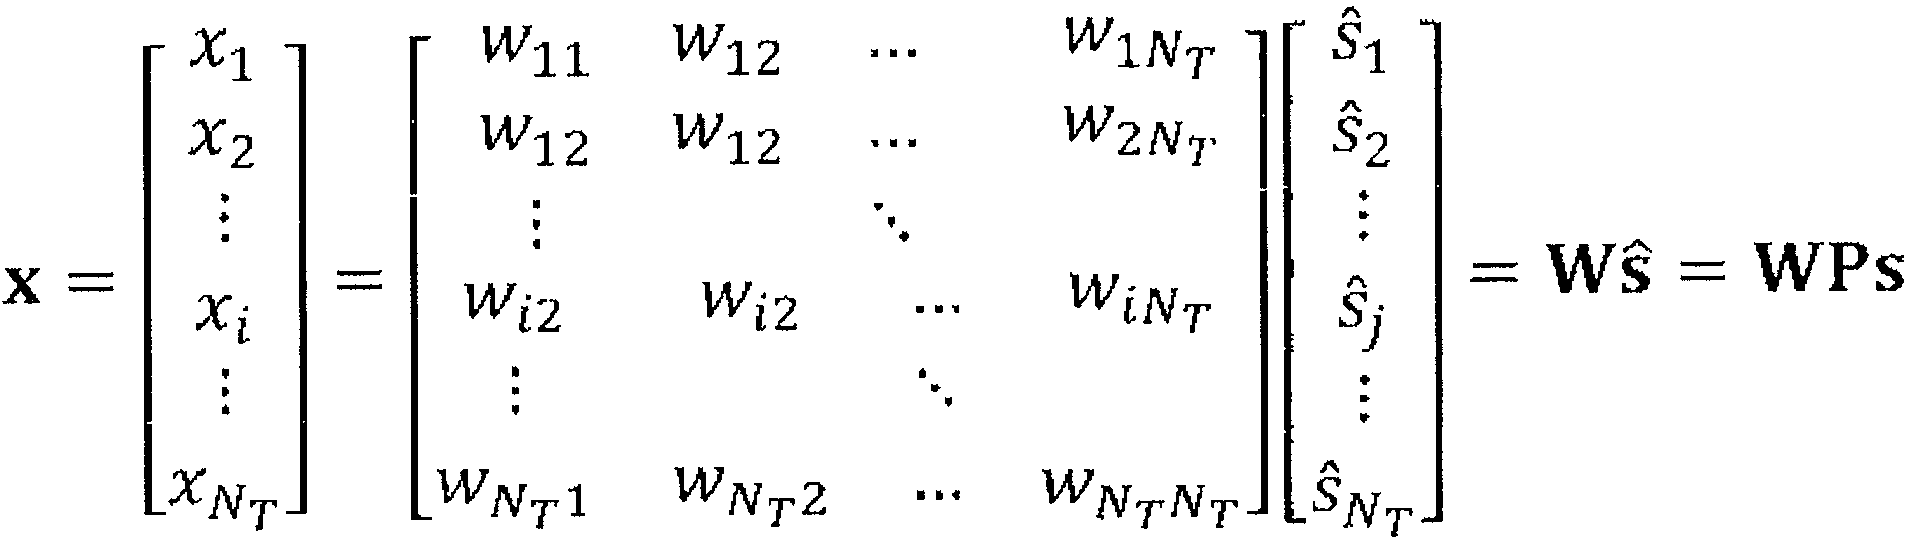 Figure 112011502812217-pat00125